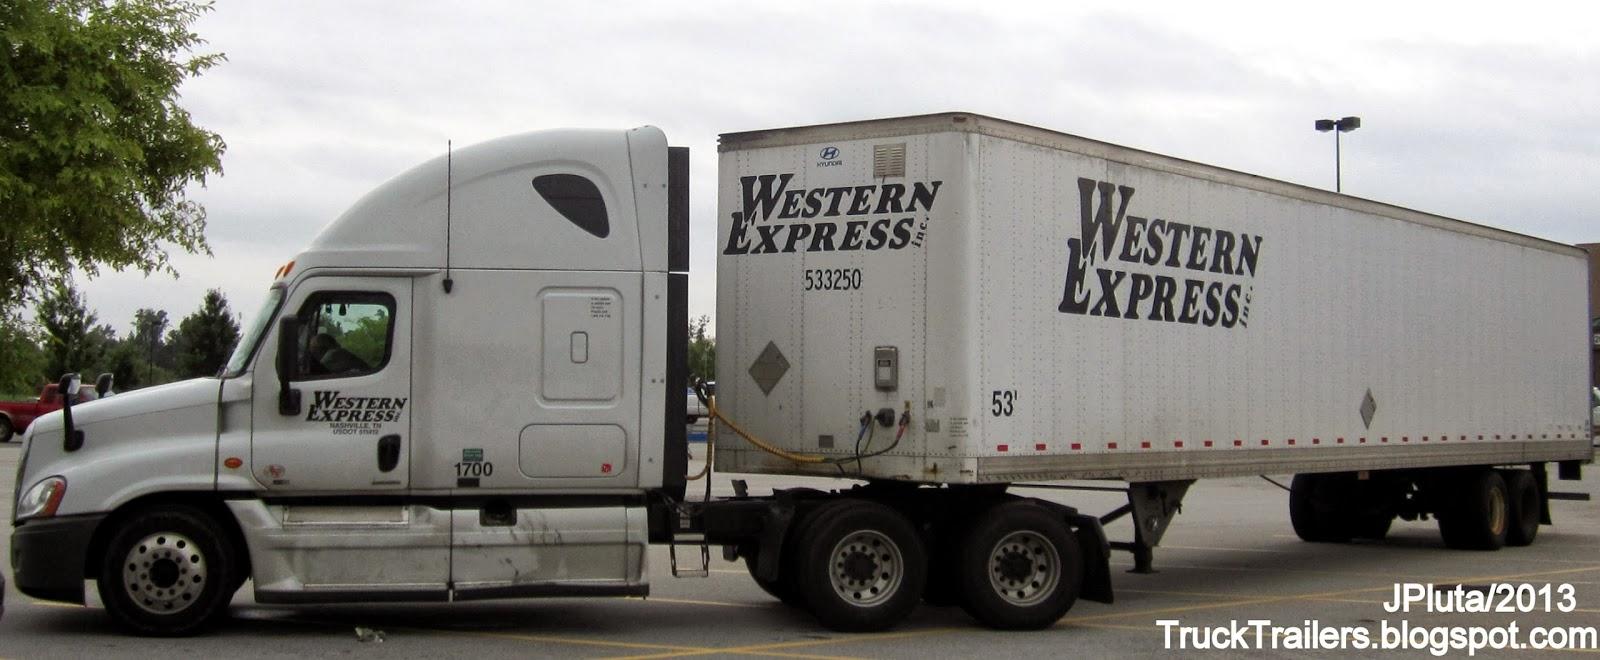 Western expreso Nashville Tn